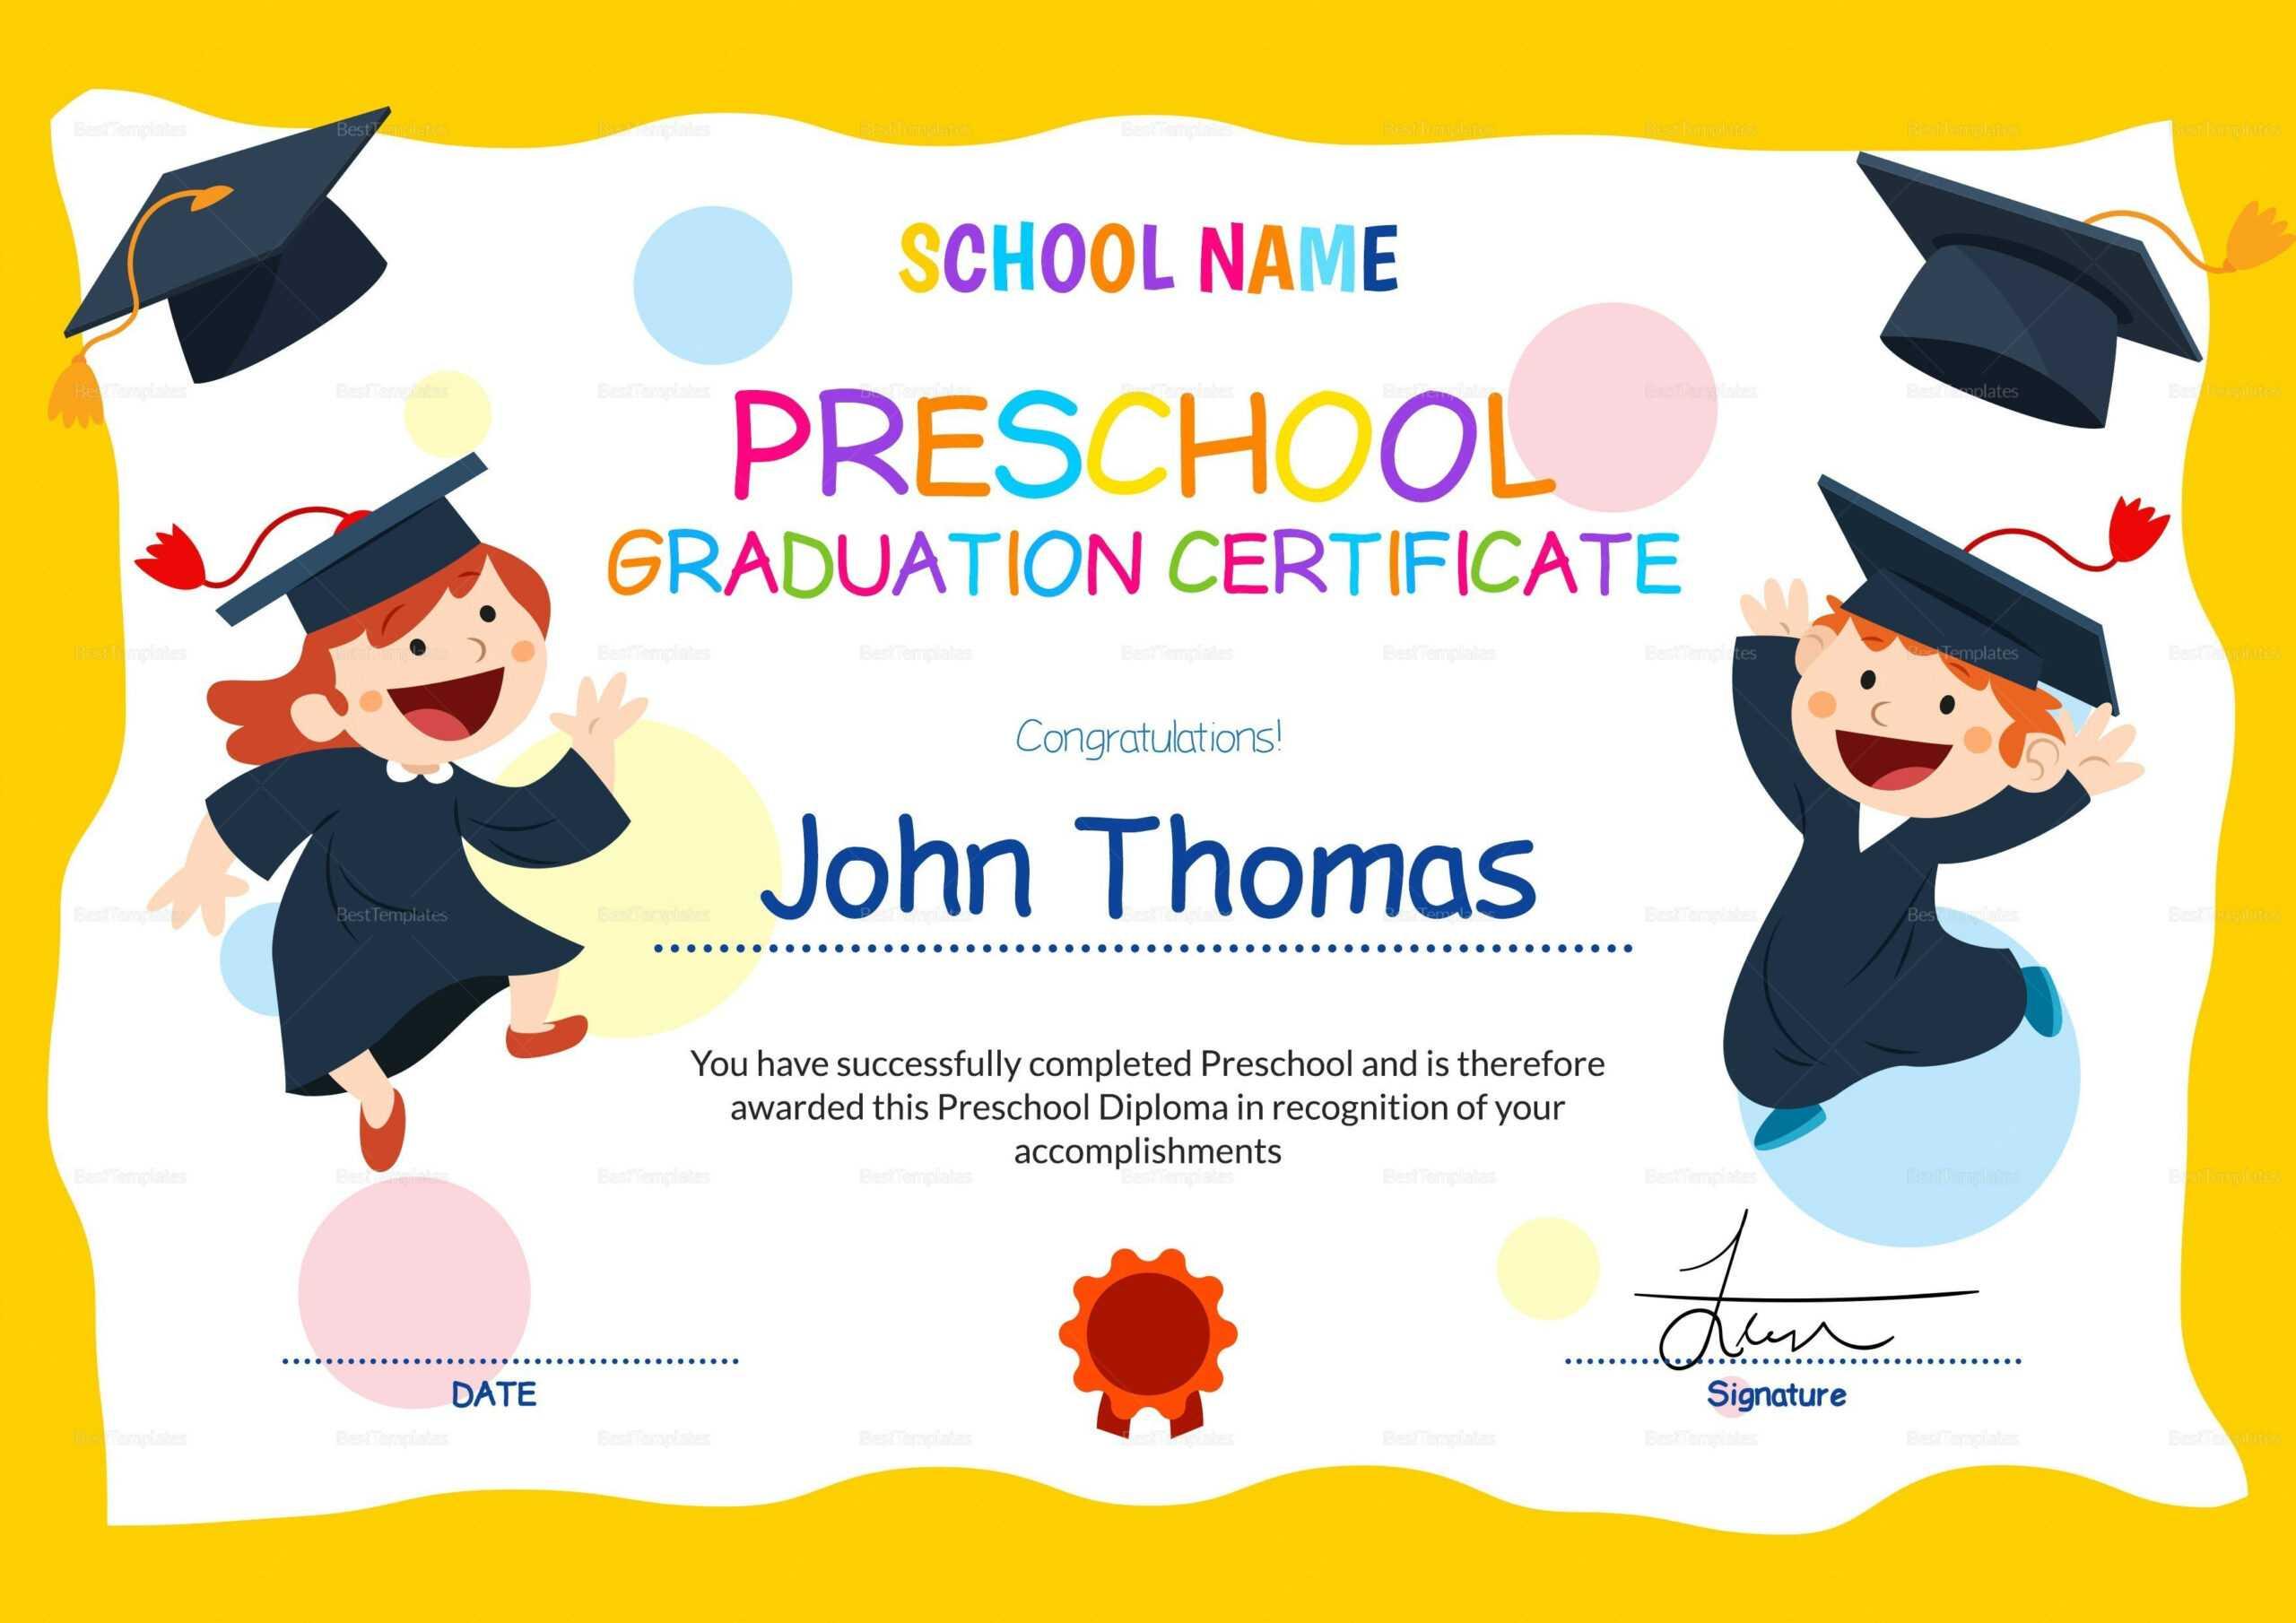 11+ Preschool Certificate Templates - Pdf | Free & Premium In Preschool Graduation Certificate Template Free